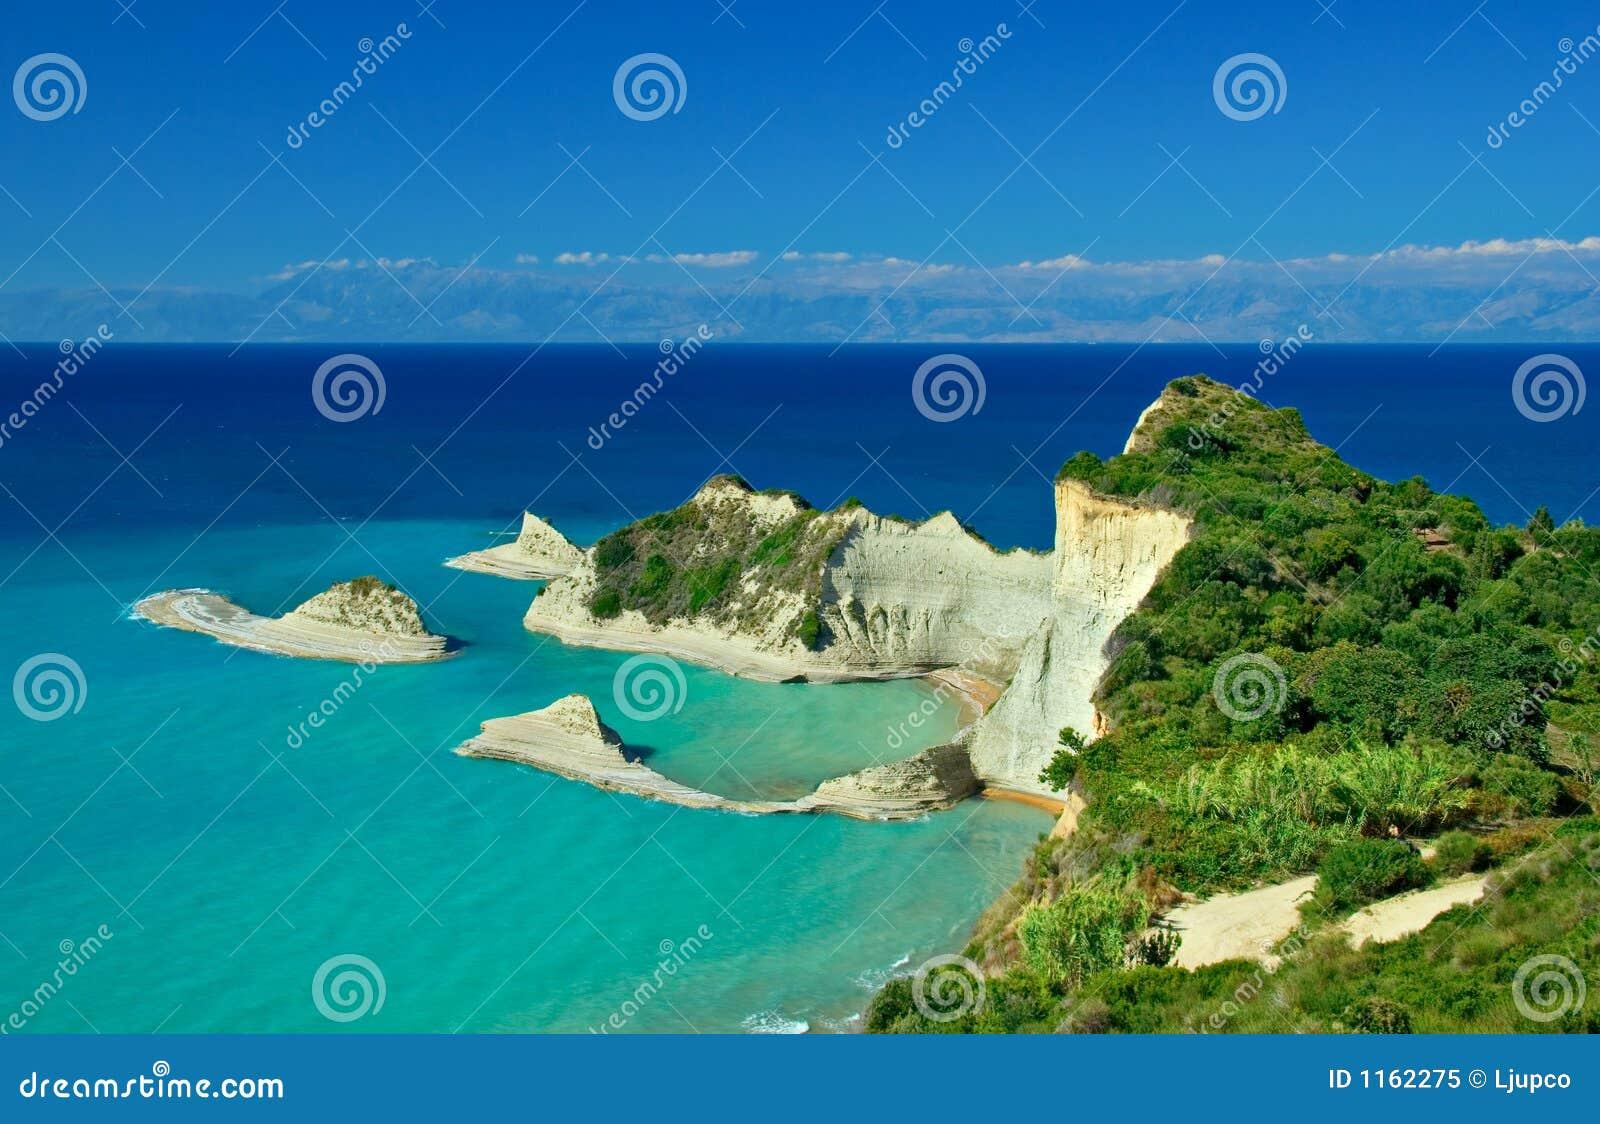 Cap Drastis avec les îles avoisinantes